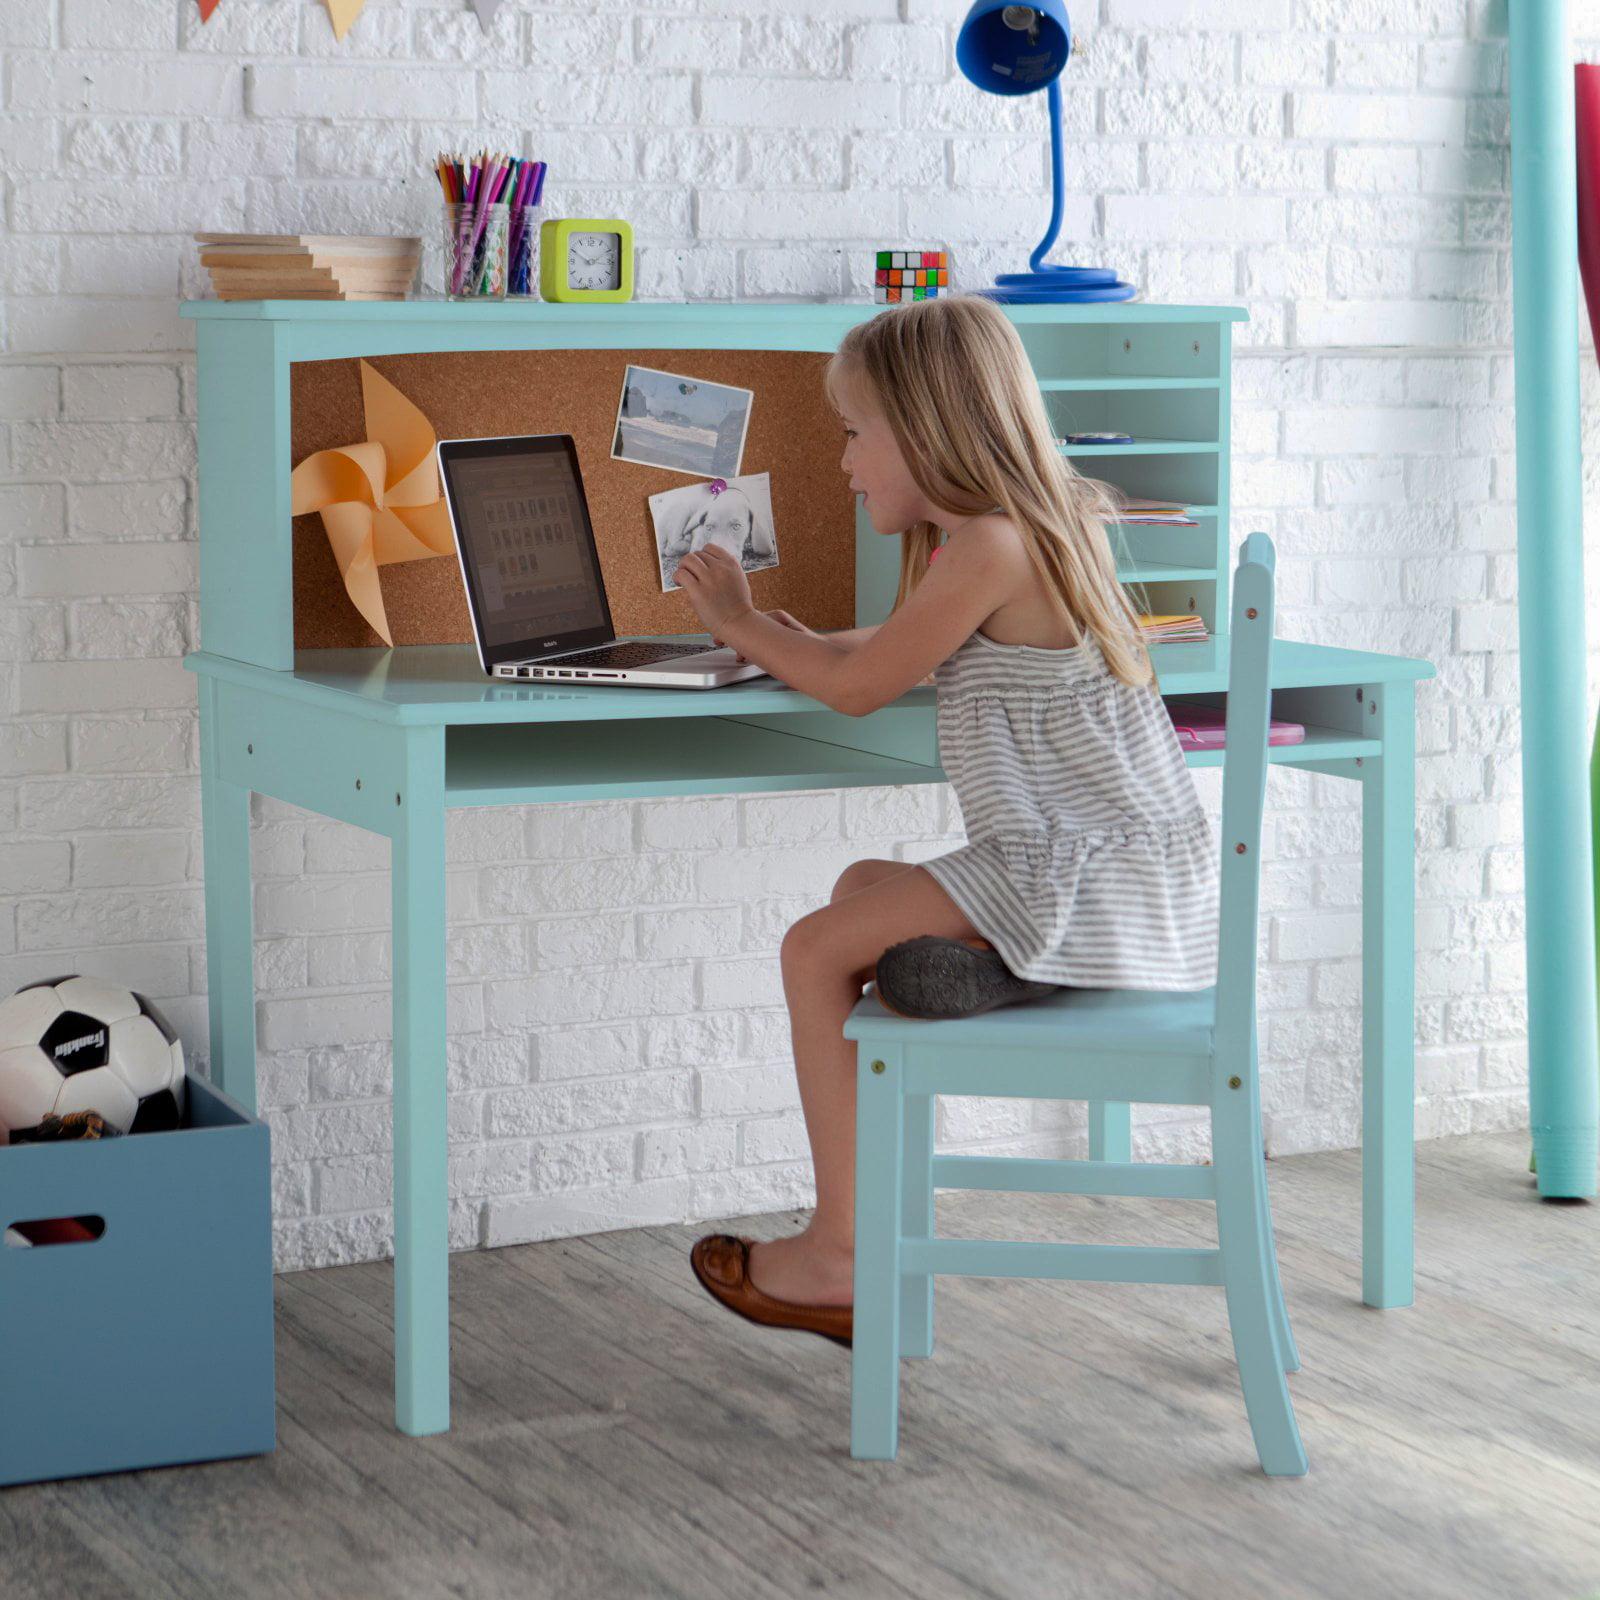 Guidecraft Media Desk & Chair Set - Teal